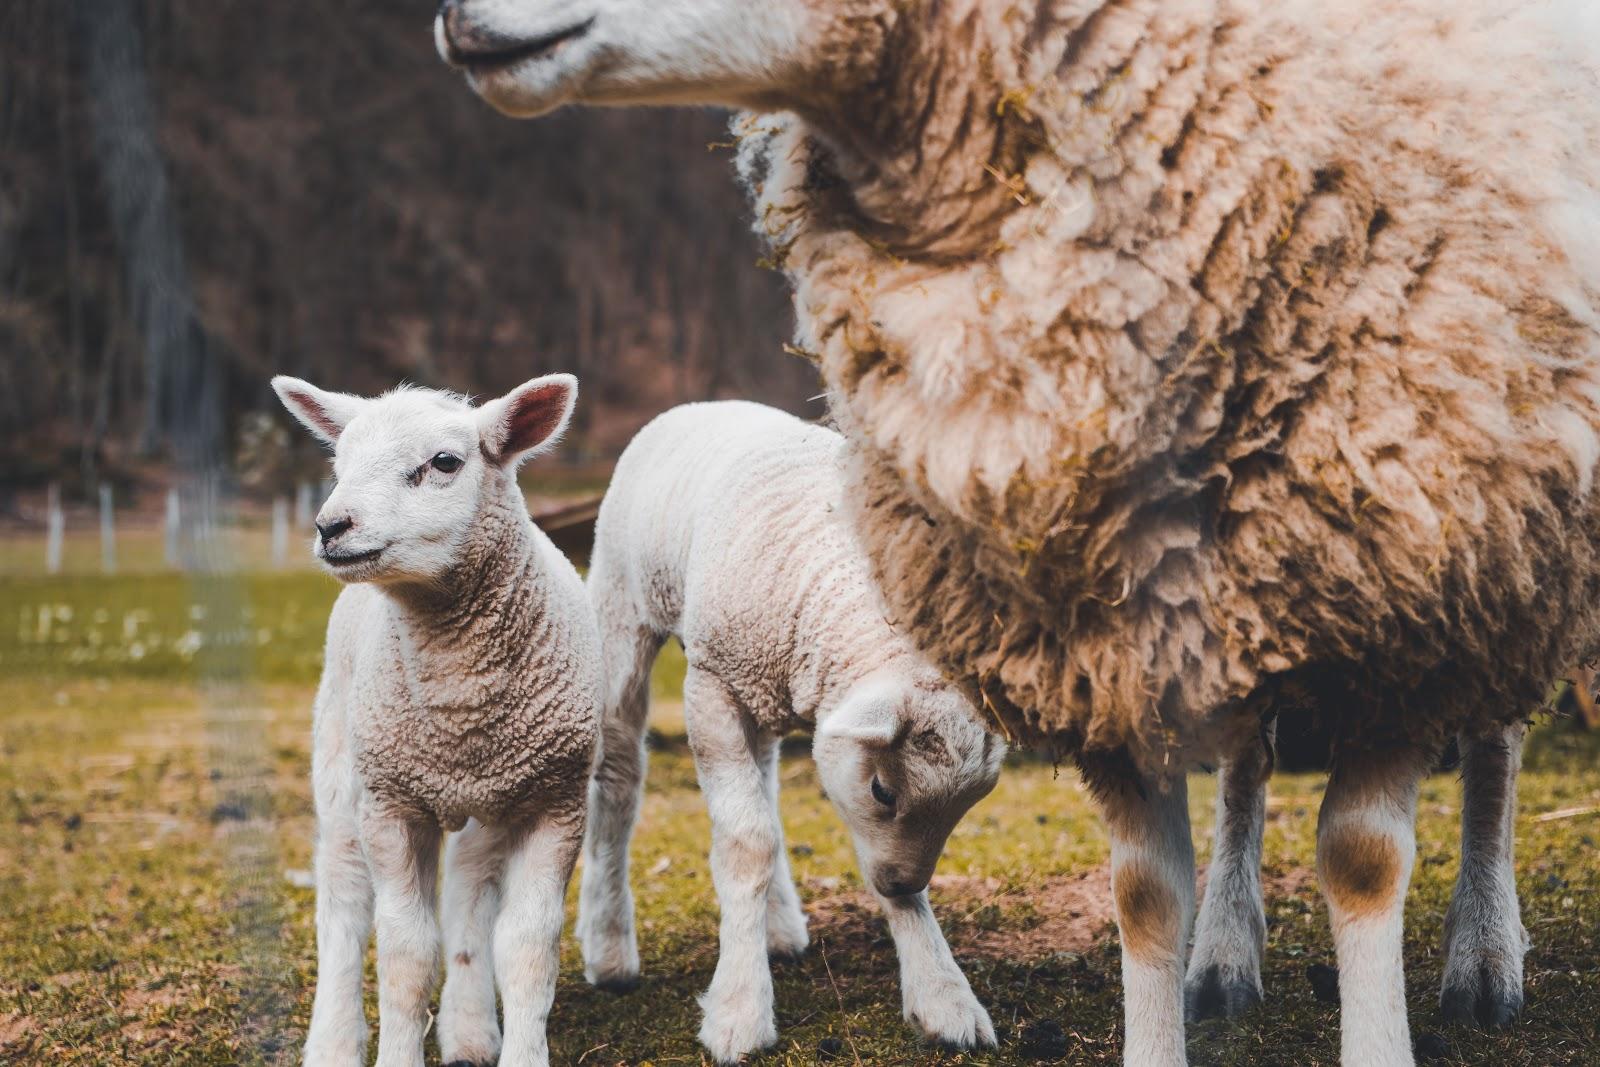 отказ от эксплуатации животных